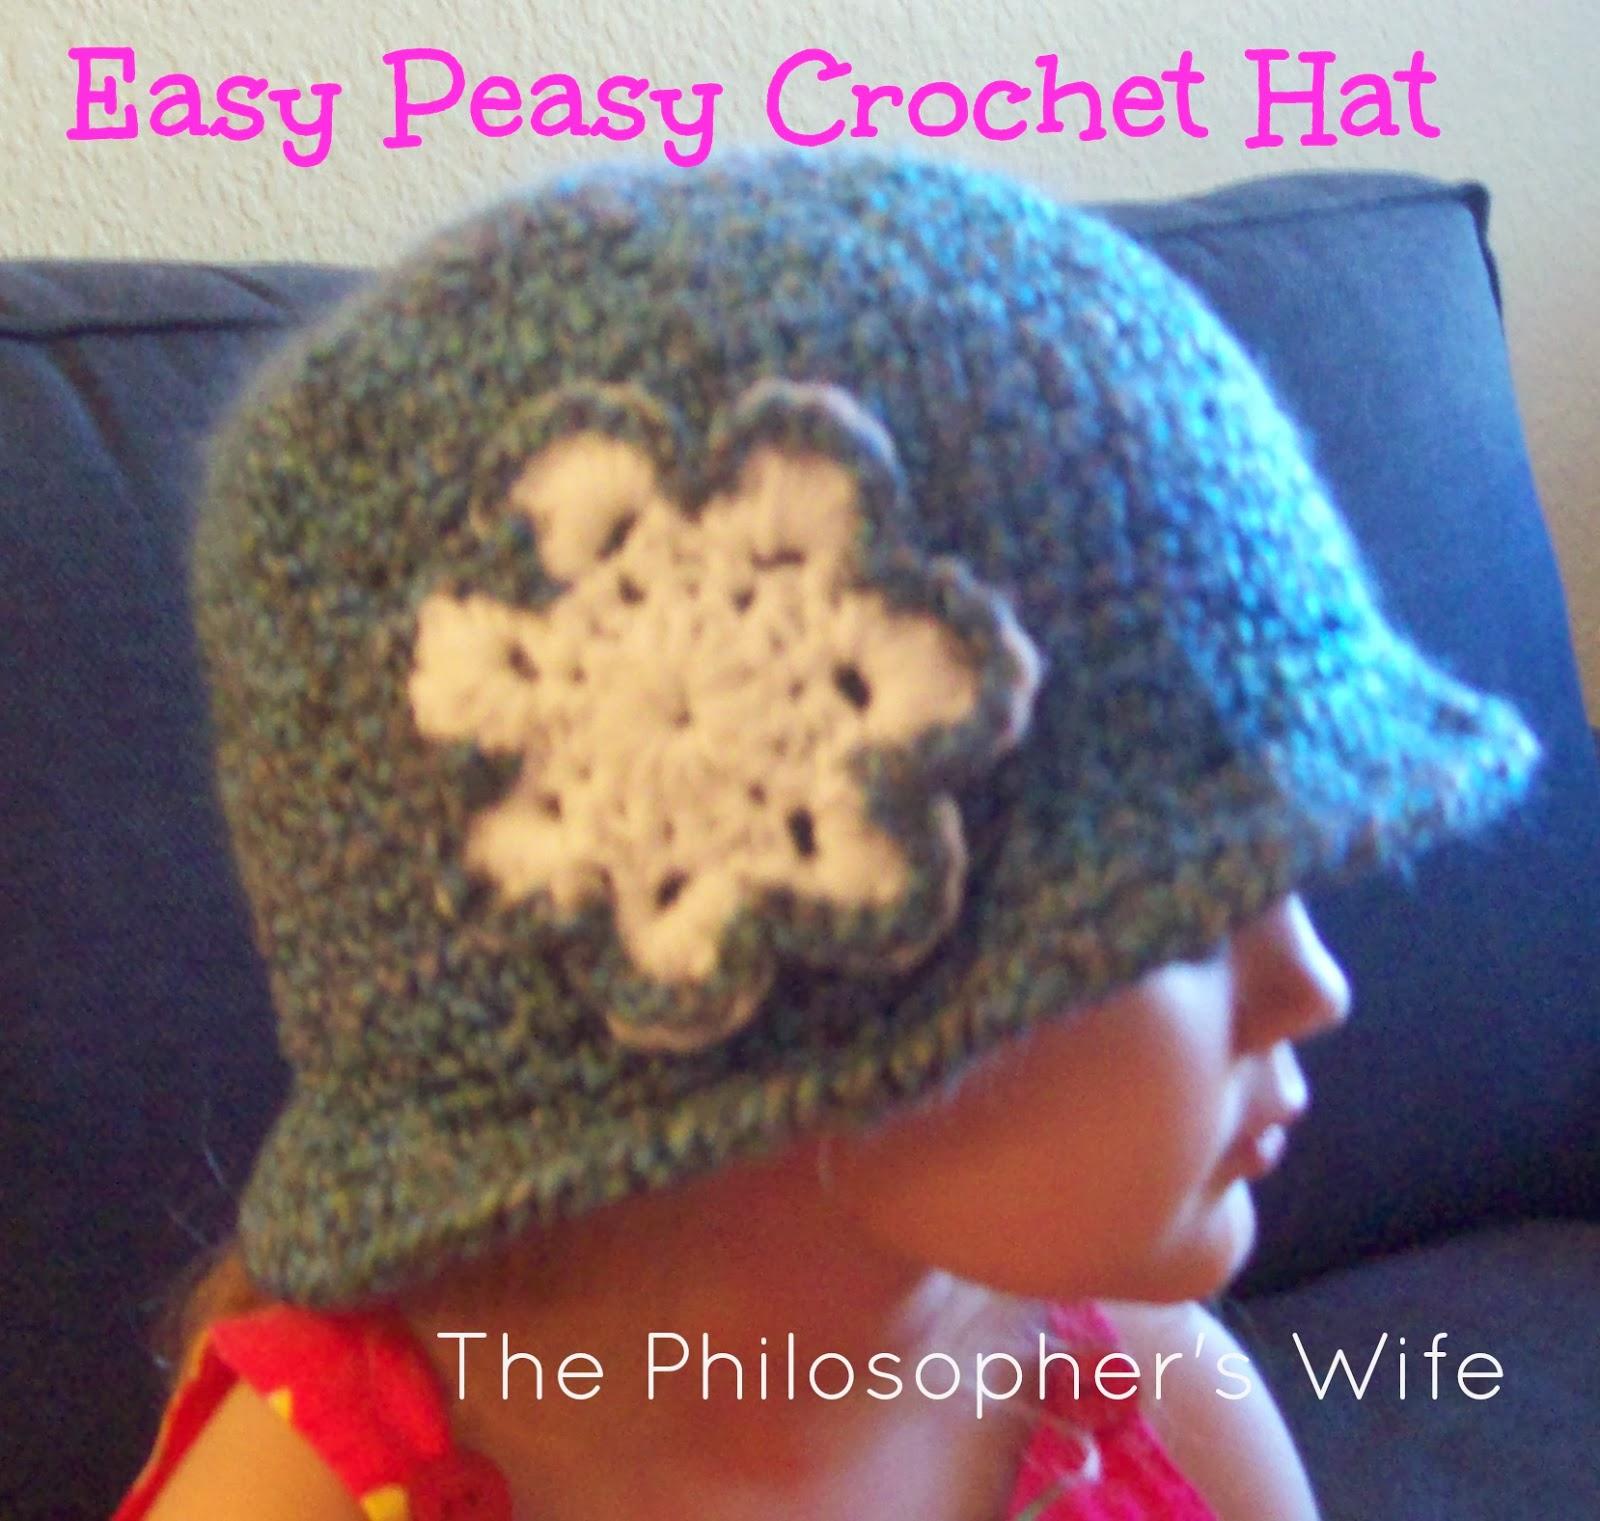 The Philosophers Wife: An Easy Peasy Crochet Hat